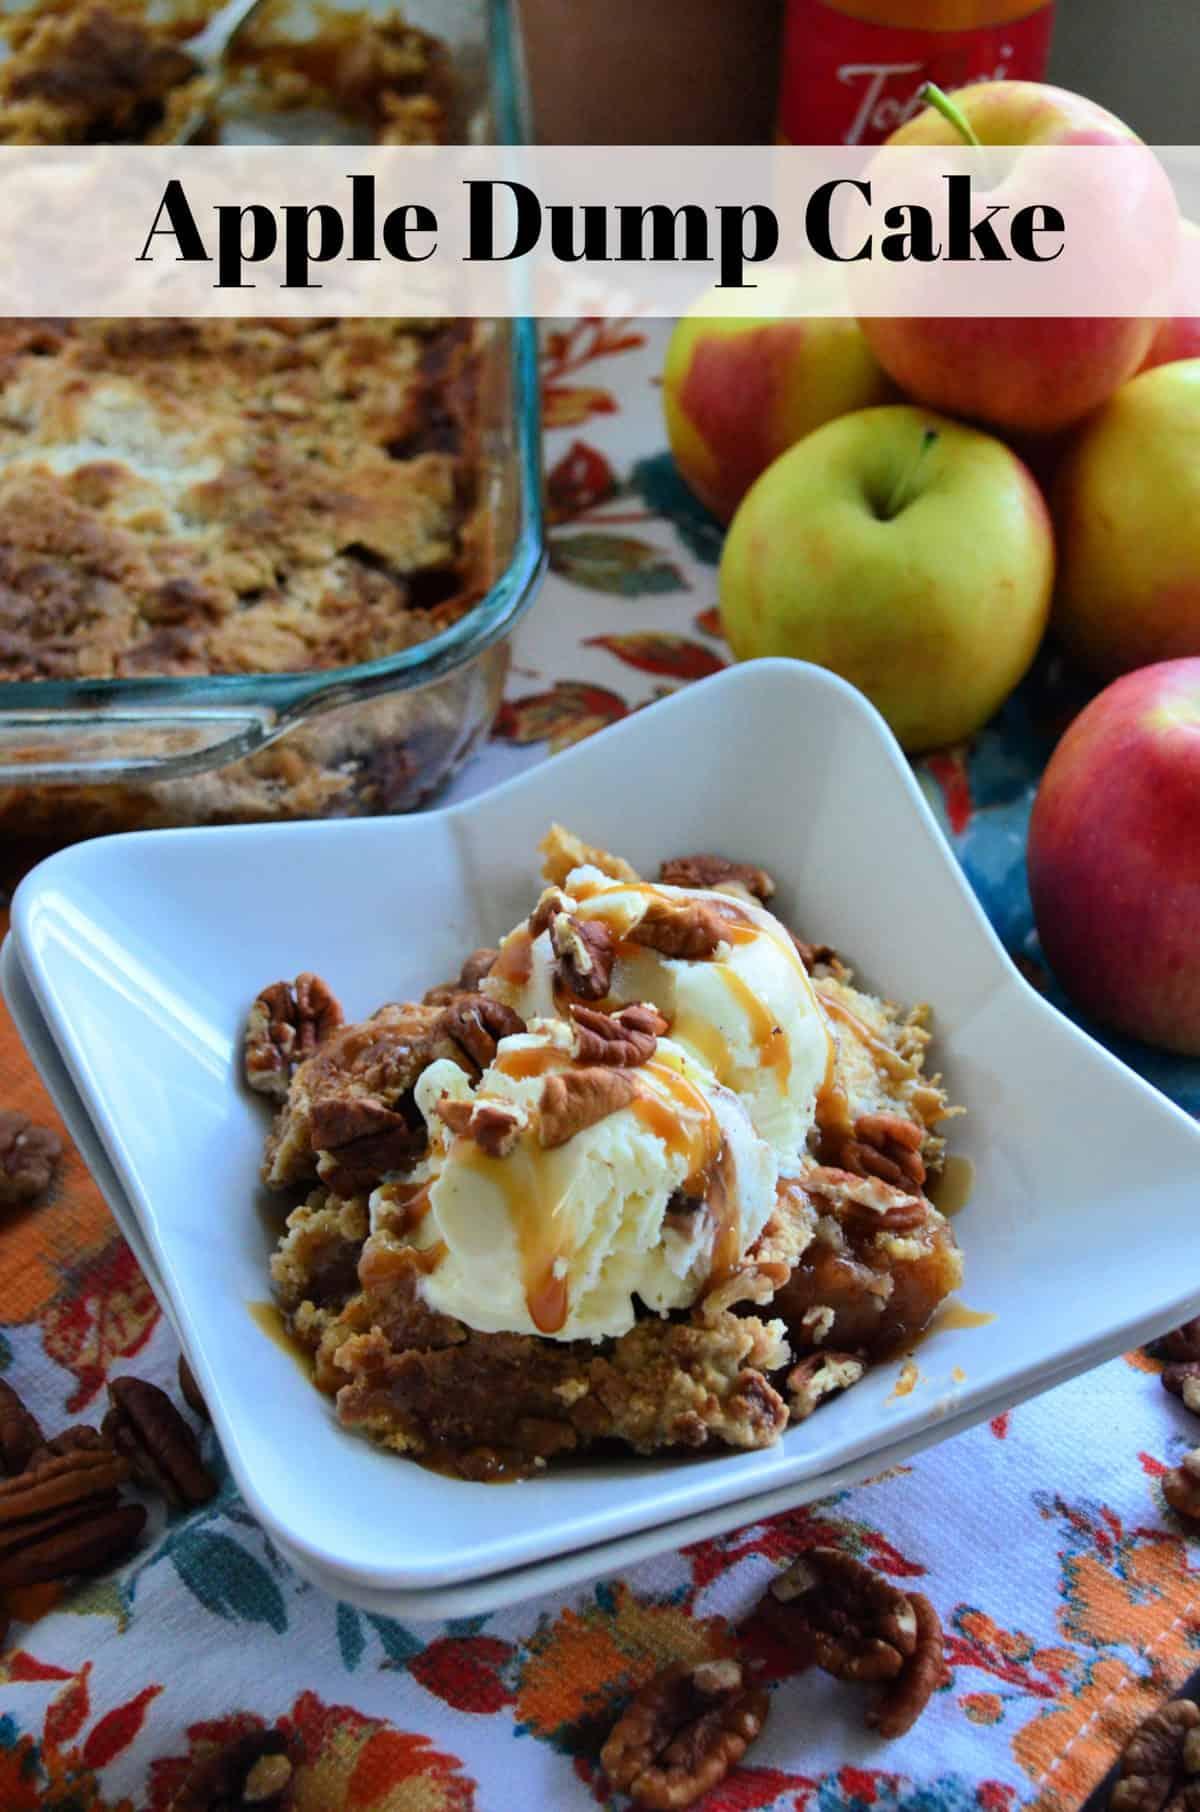 Apple Dump Cake Dessert Recipe